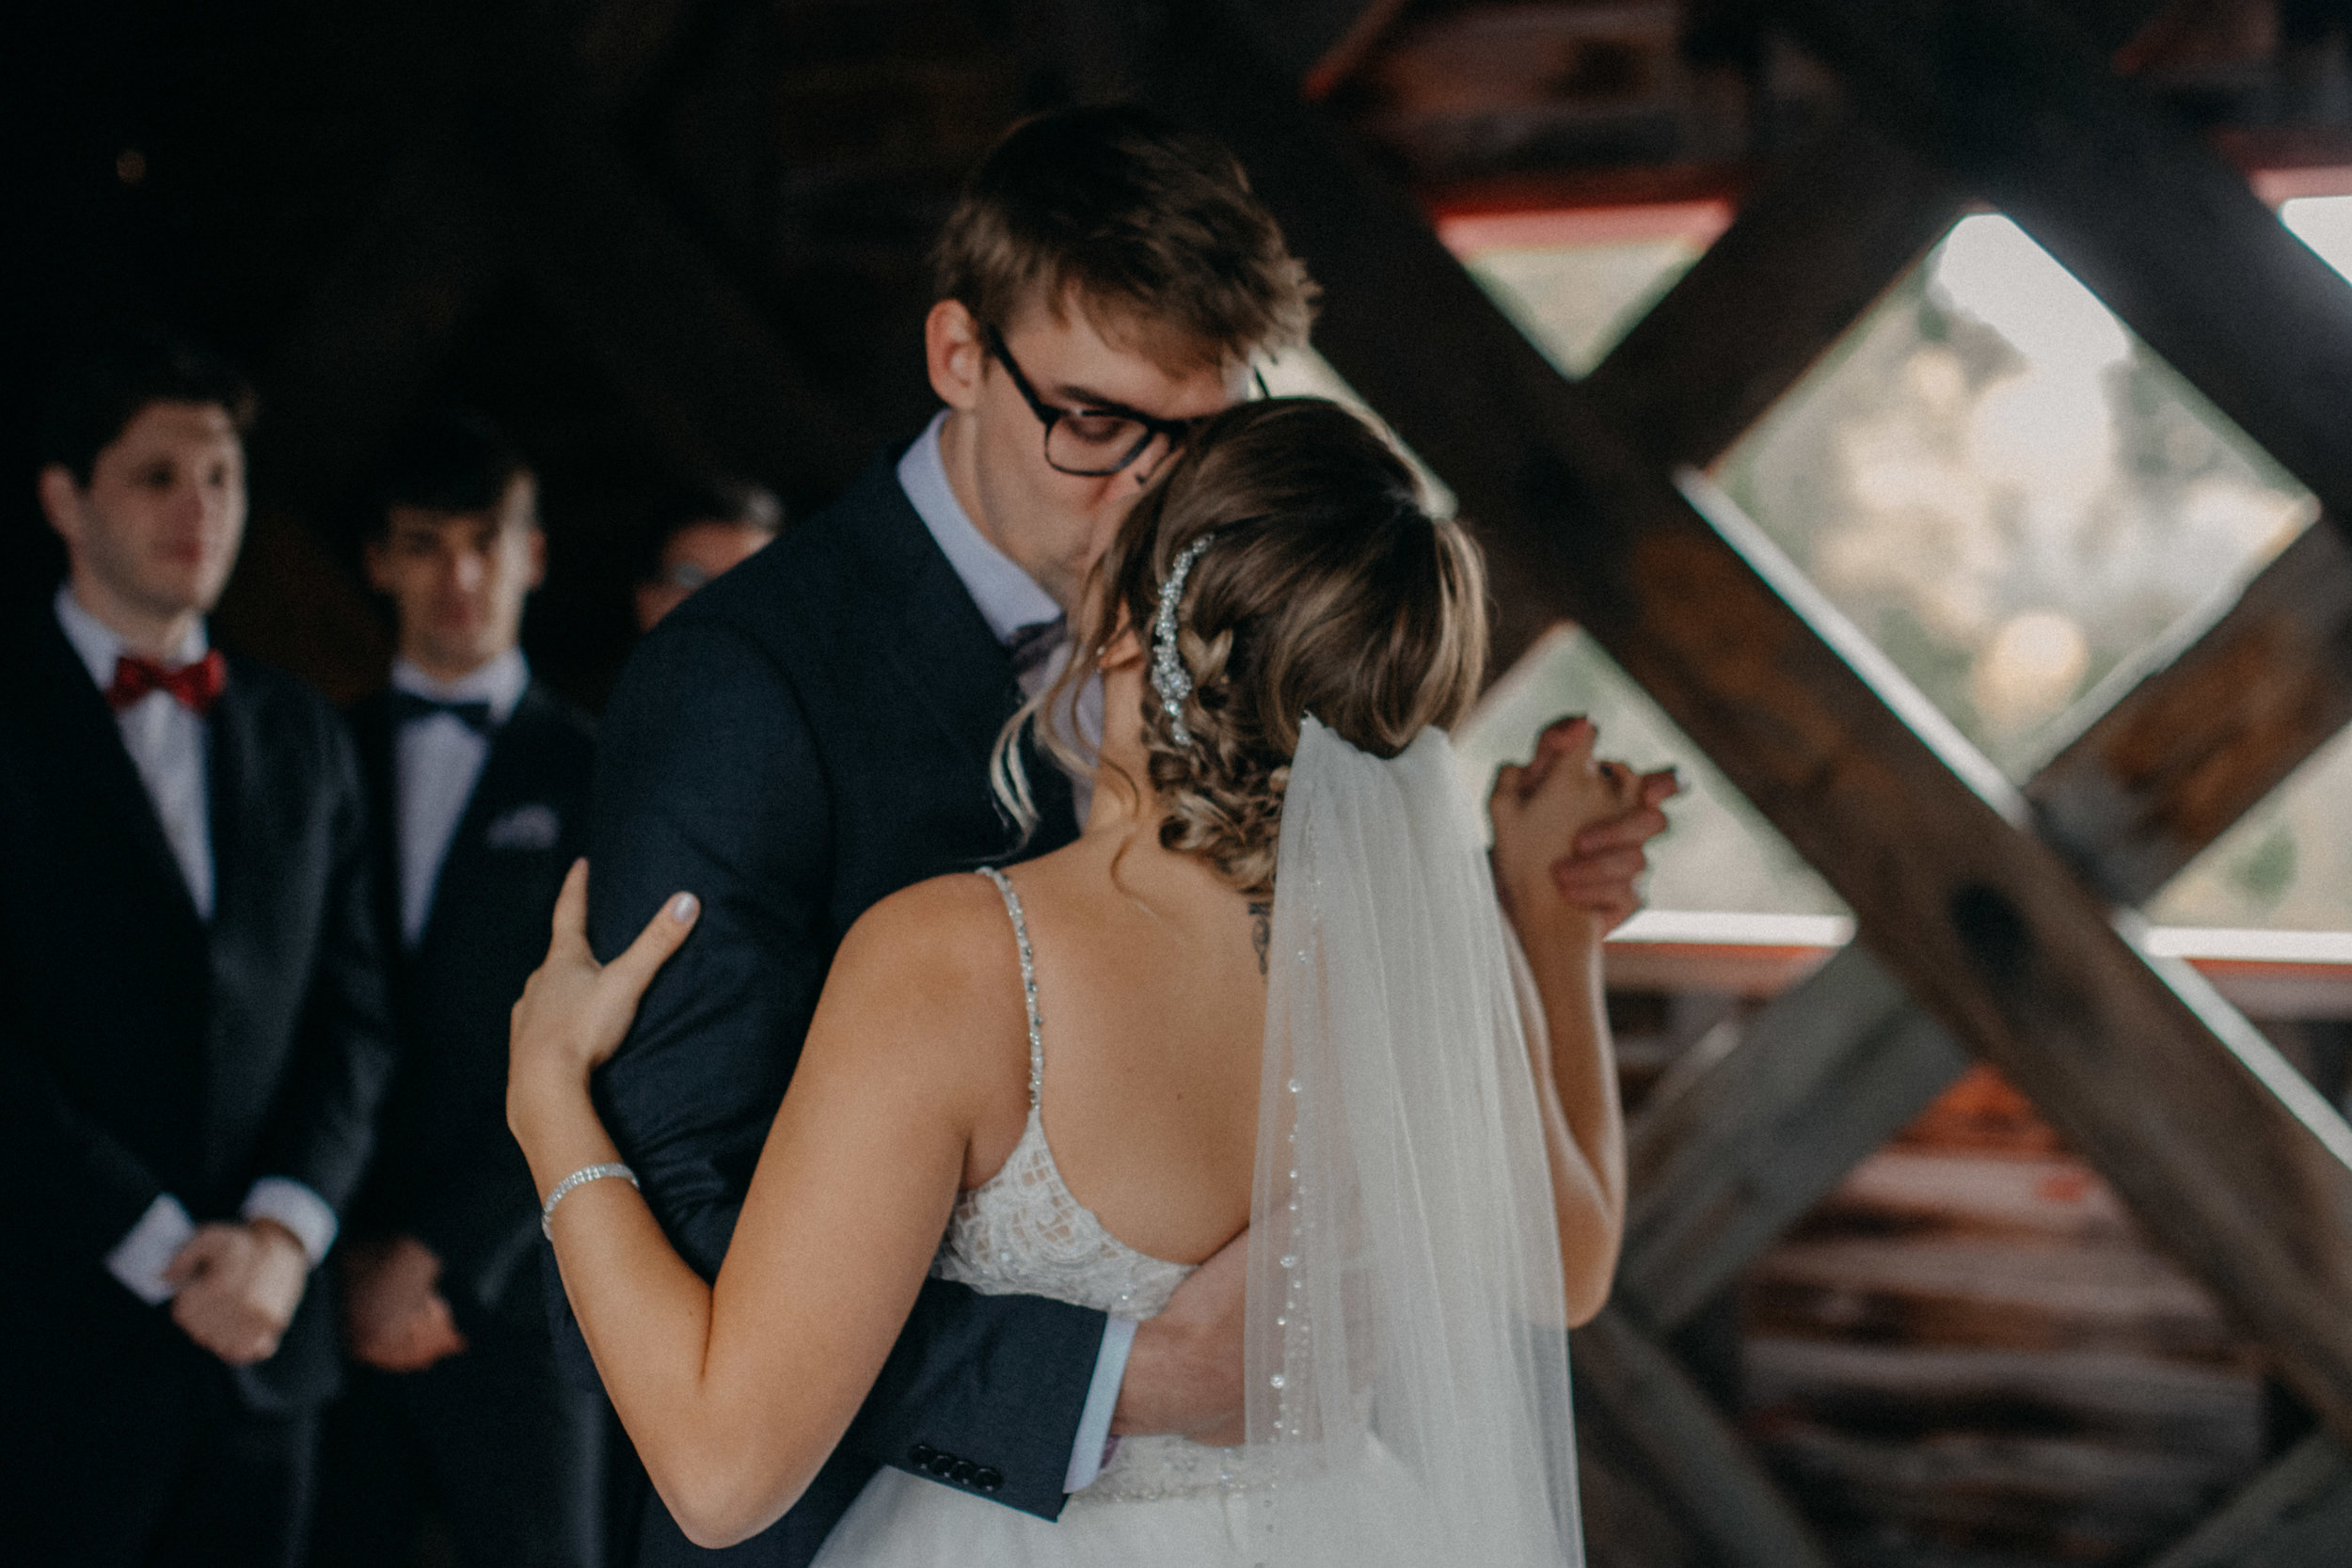 photographe_gatineau_mariage_ottawa_photographer_wedding_natasha_liard_photo_documentary_candid_lifestyle_wakefield_mill_red_bridge (26).jpg